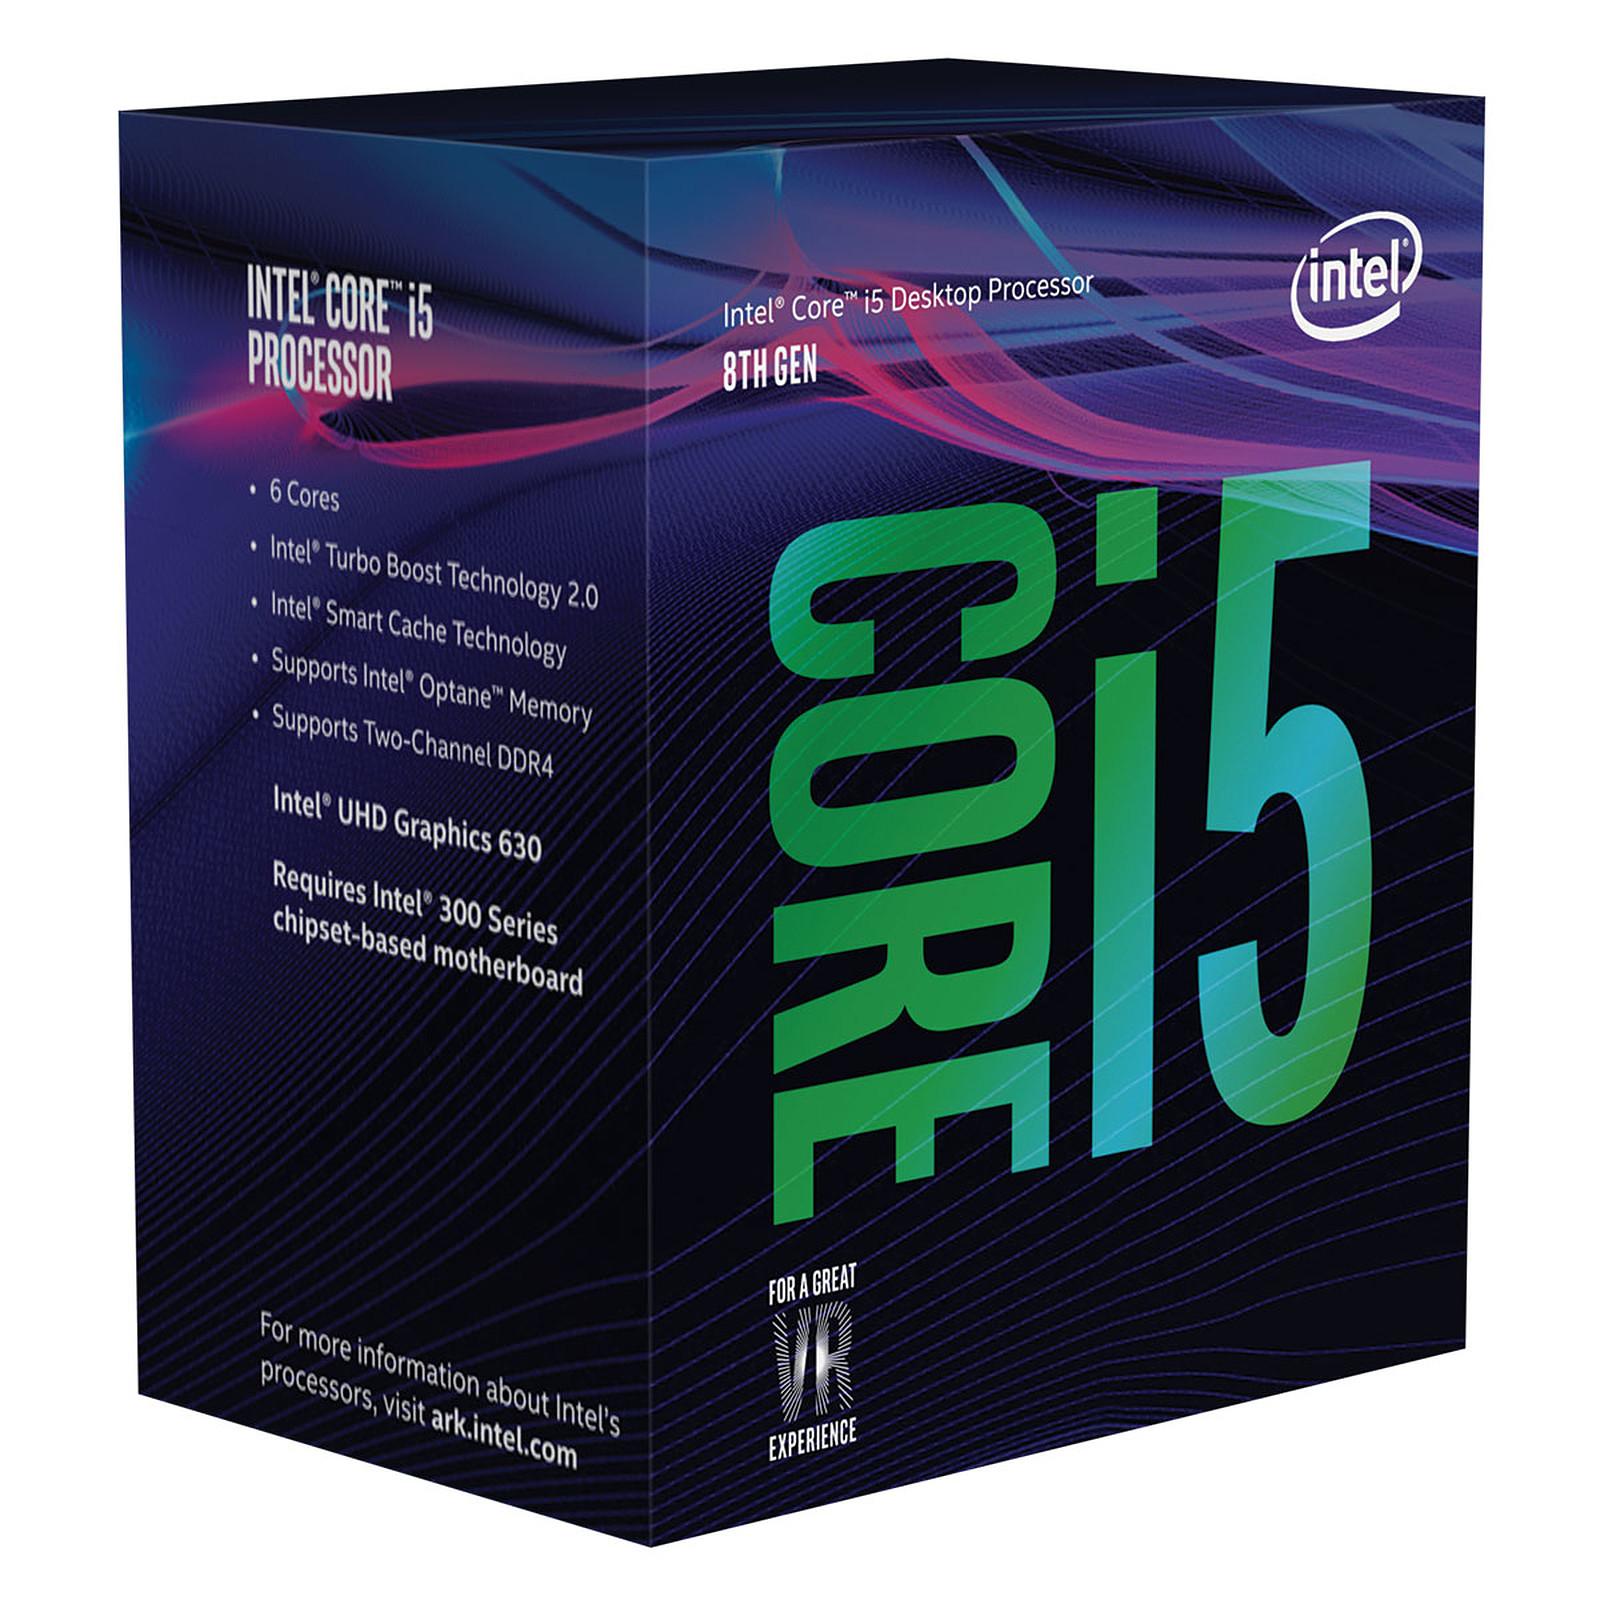 Intel Core i5-8600 (3.1 GHz)